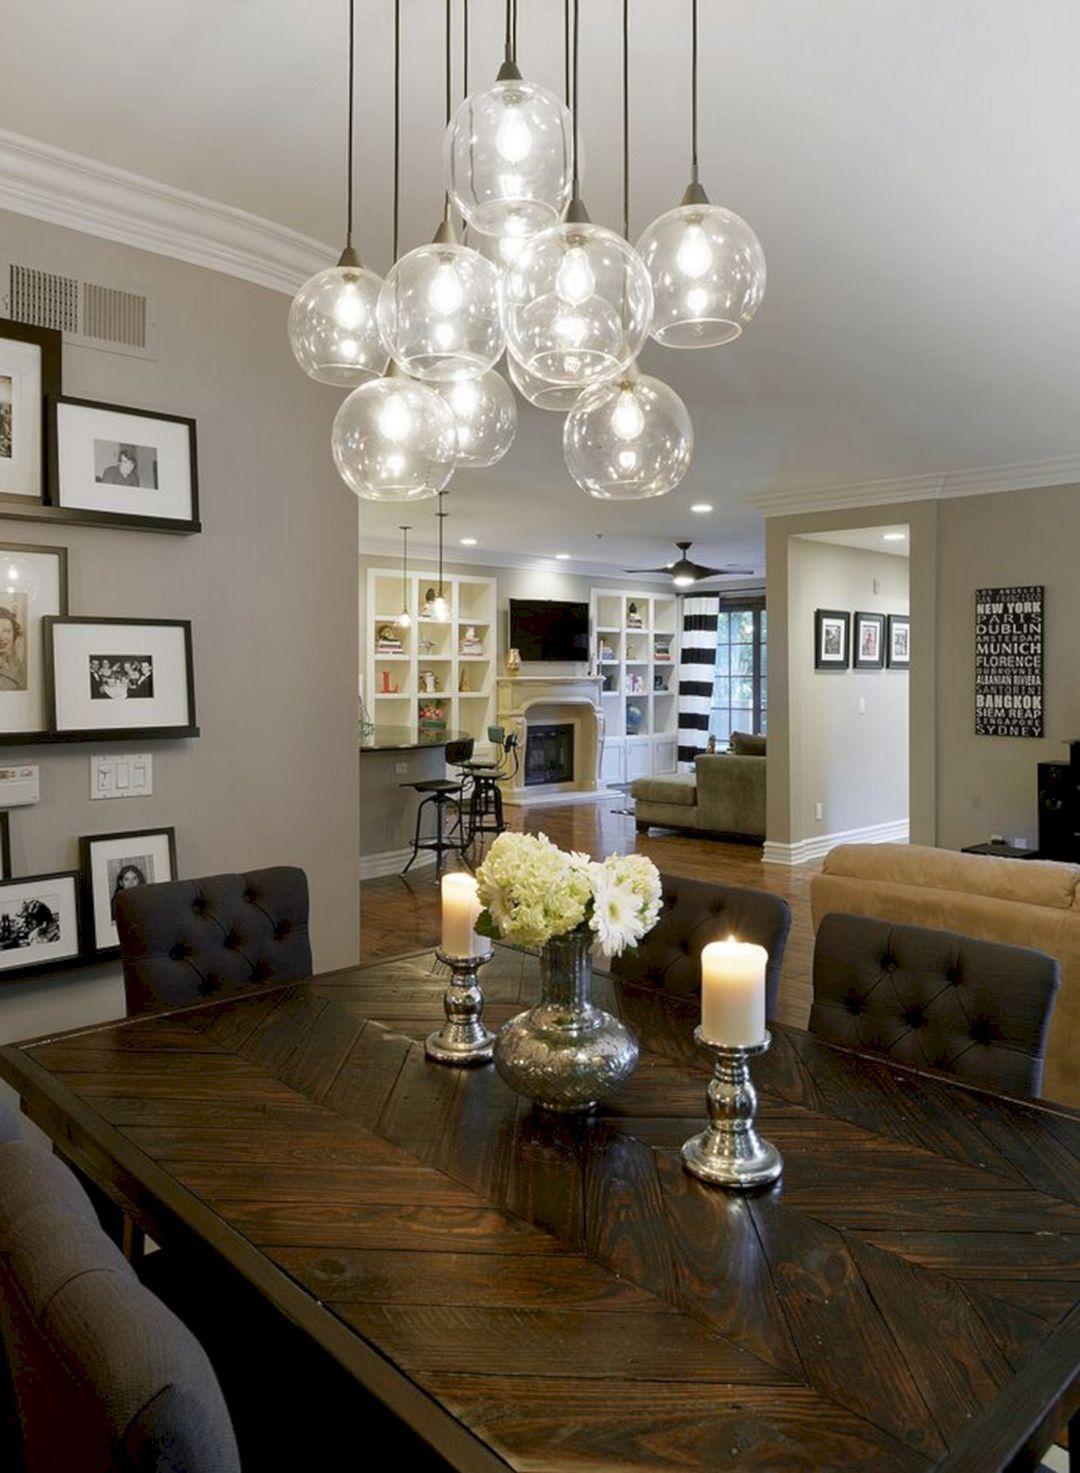 Marvelous 23 Beautiful Dining Room Lighting Ideas For Por Home Design Https Freshouz